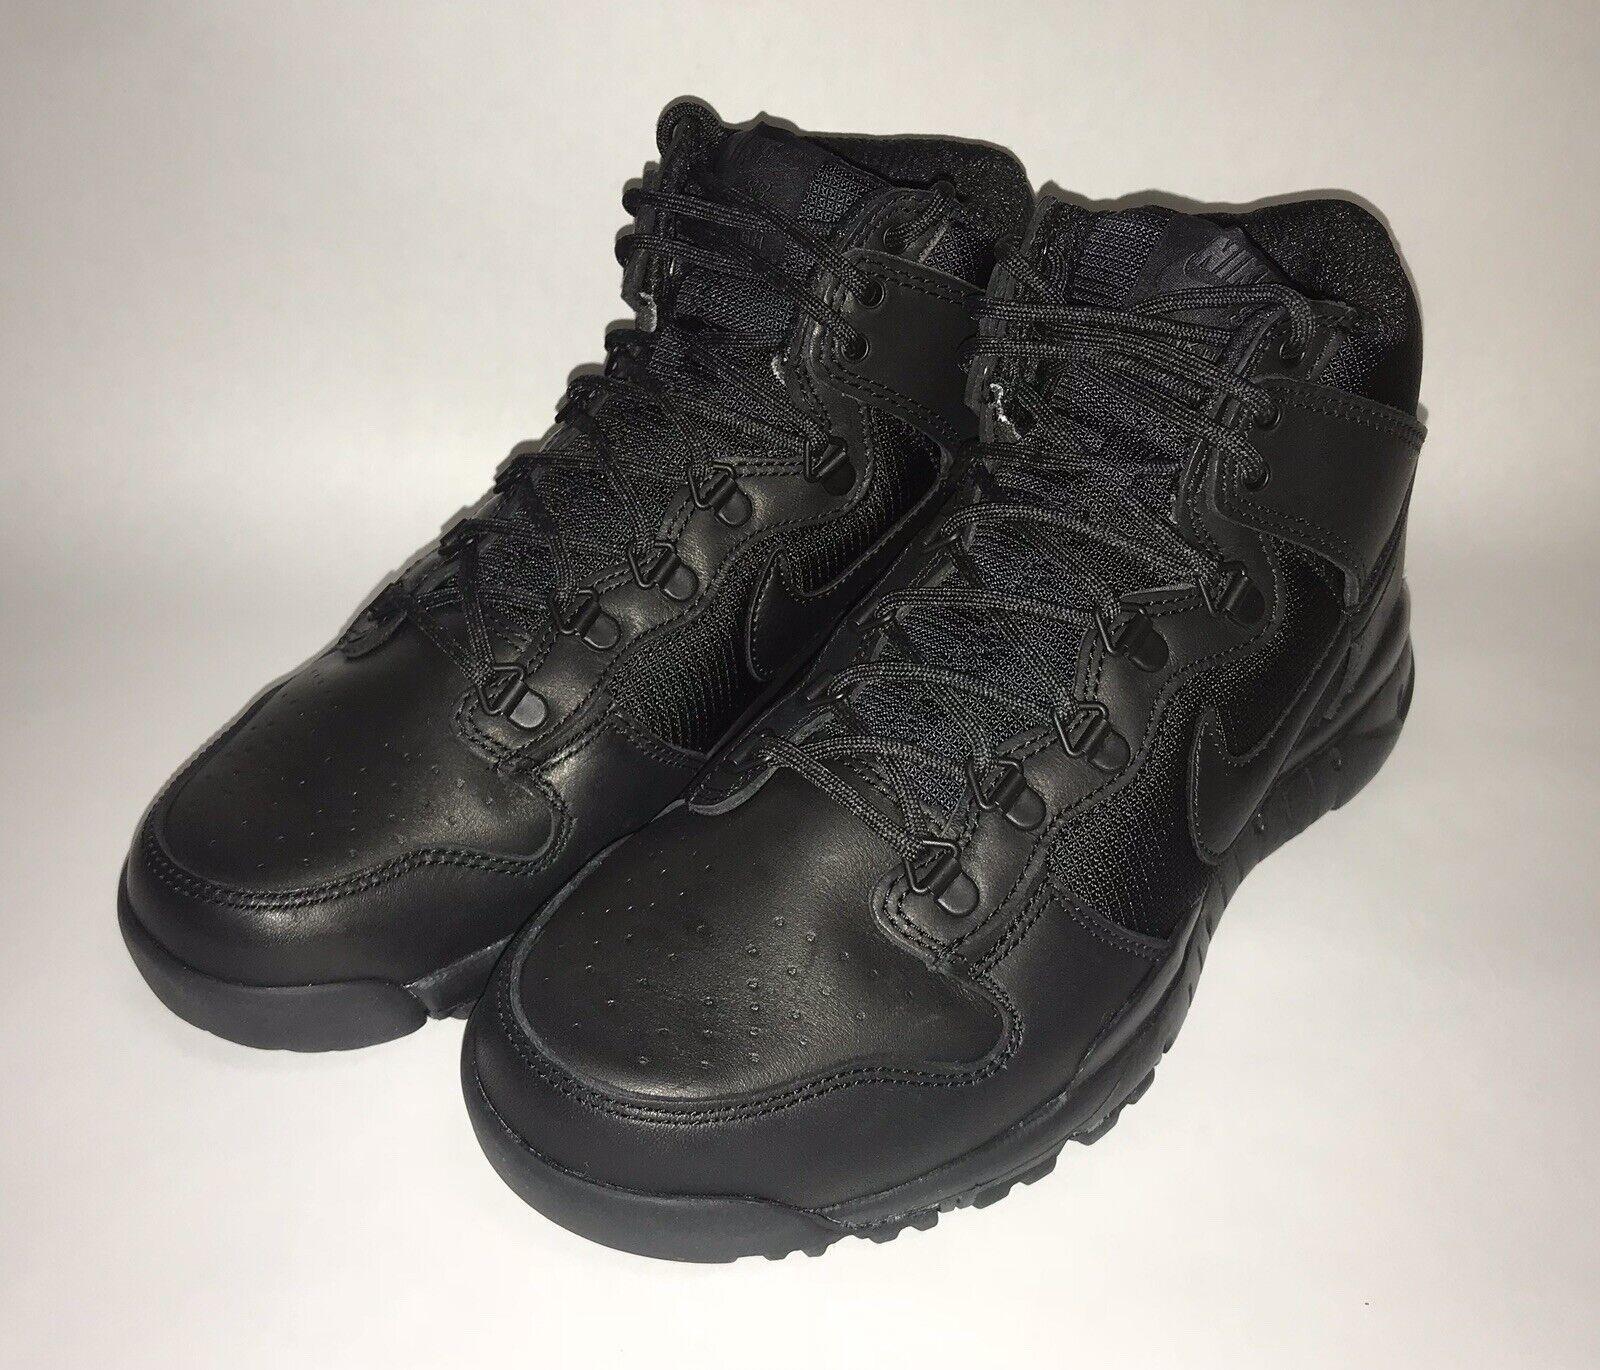 Nike Mens SB Dunk High Boot Size 8 Triple Black shoes (536182-001)